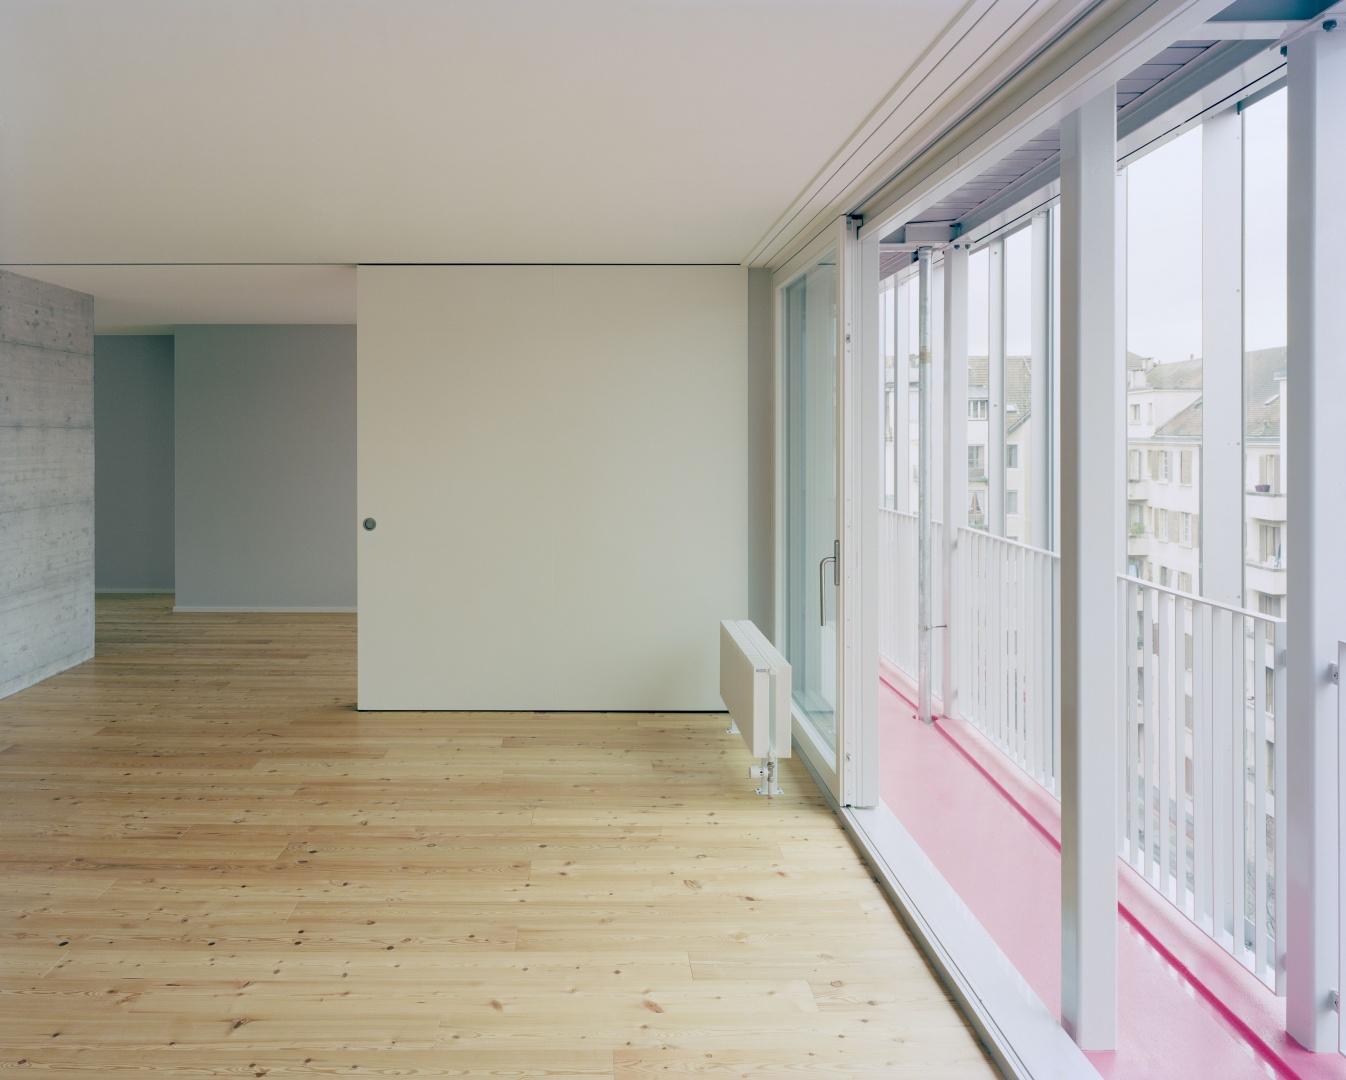 6e étage, maisonette © Joël Tettamanti